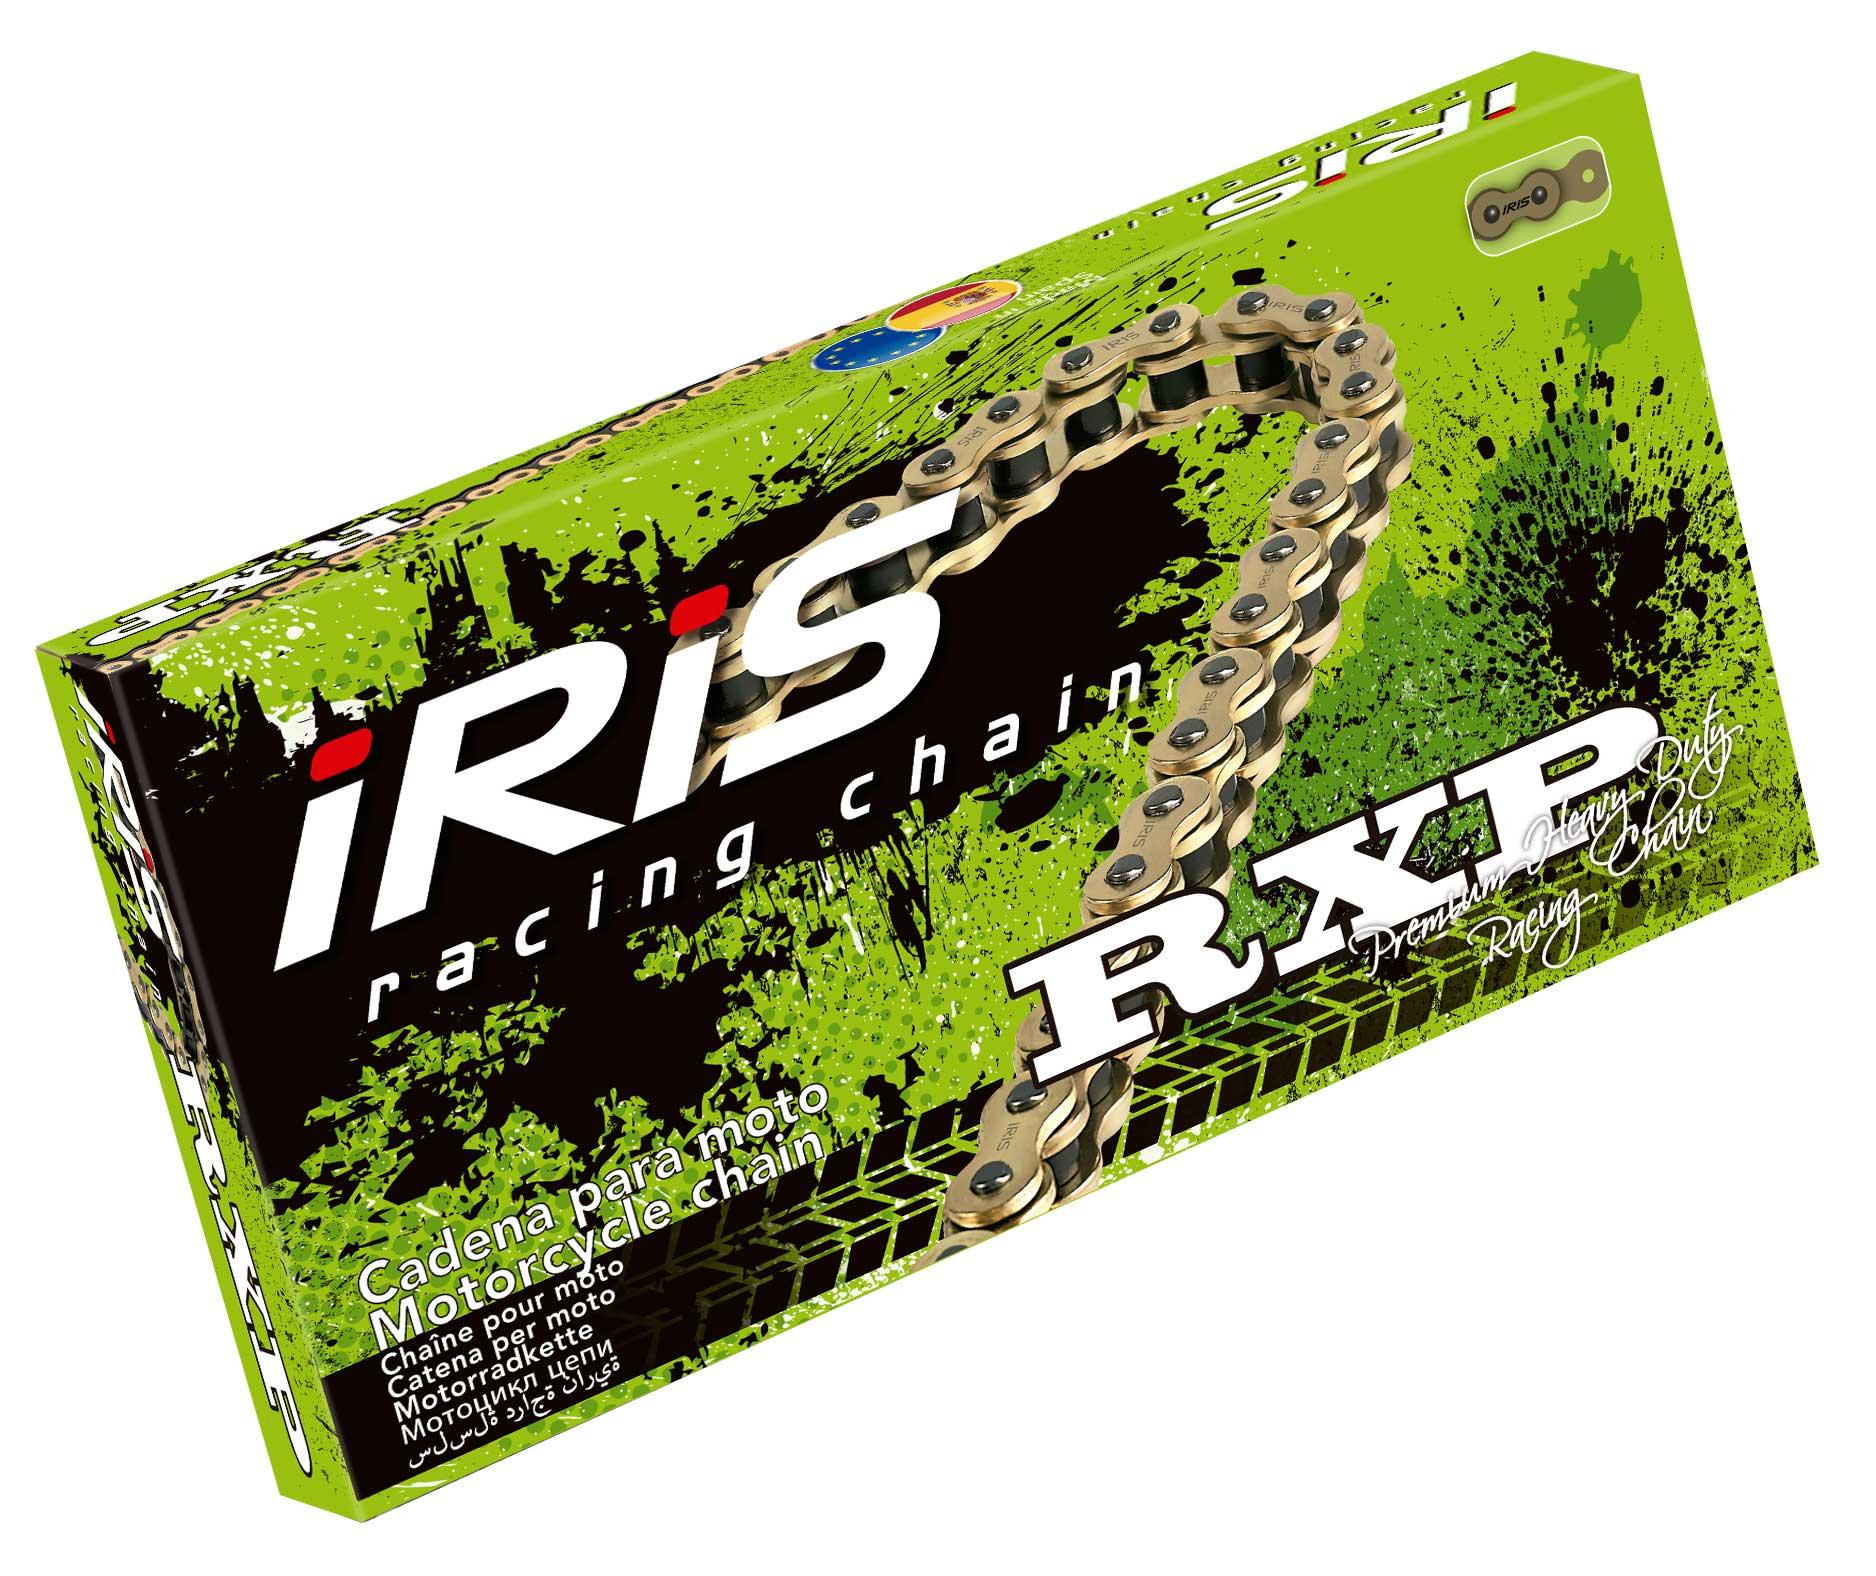 CHAIN IRIS 420RXP-106 SUPER HEAVY CHAIN FOR MX (GOLD)